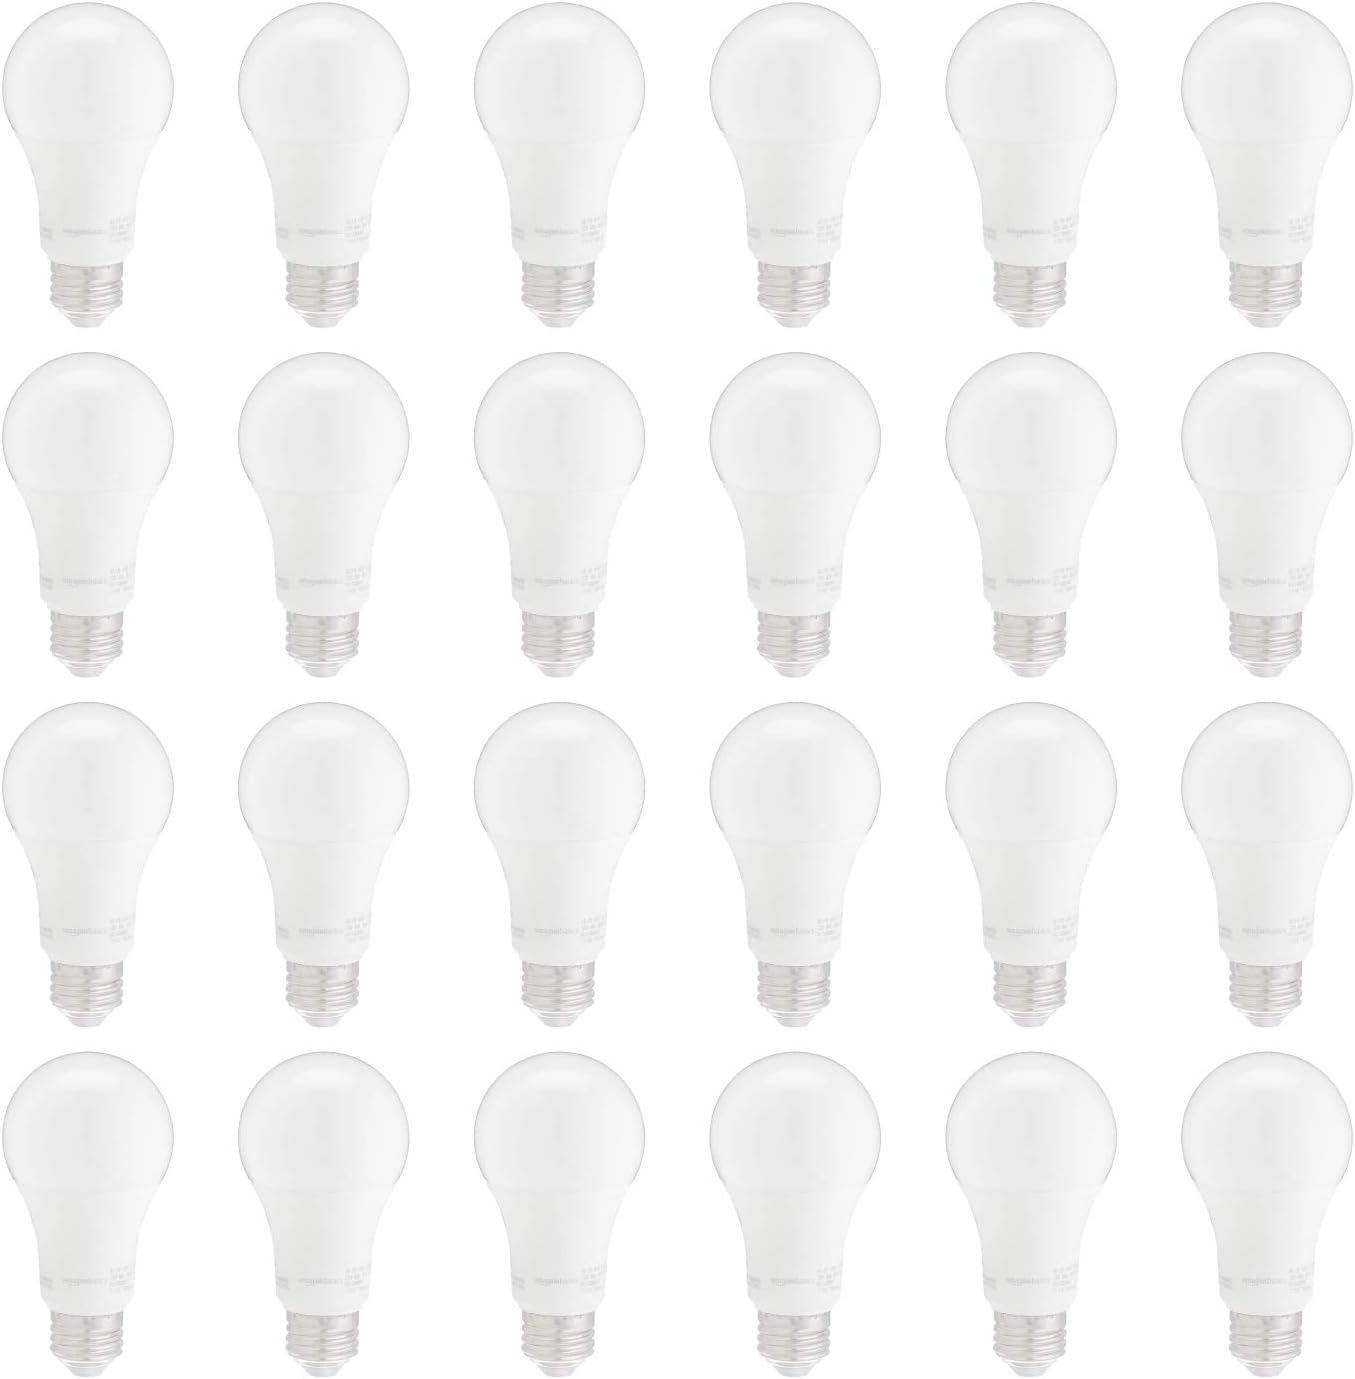 AmazonBasics 100W Equivalent, Soft White, Non-Dimmable, 10,000 Hour Lifetime, A19 LED Light Bulb | 24-Pack